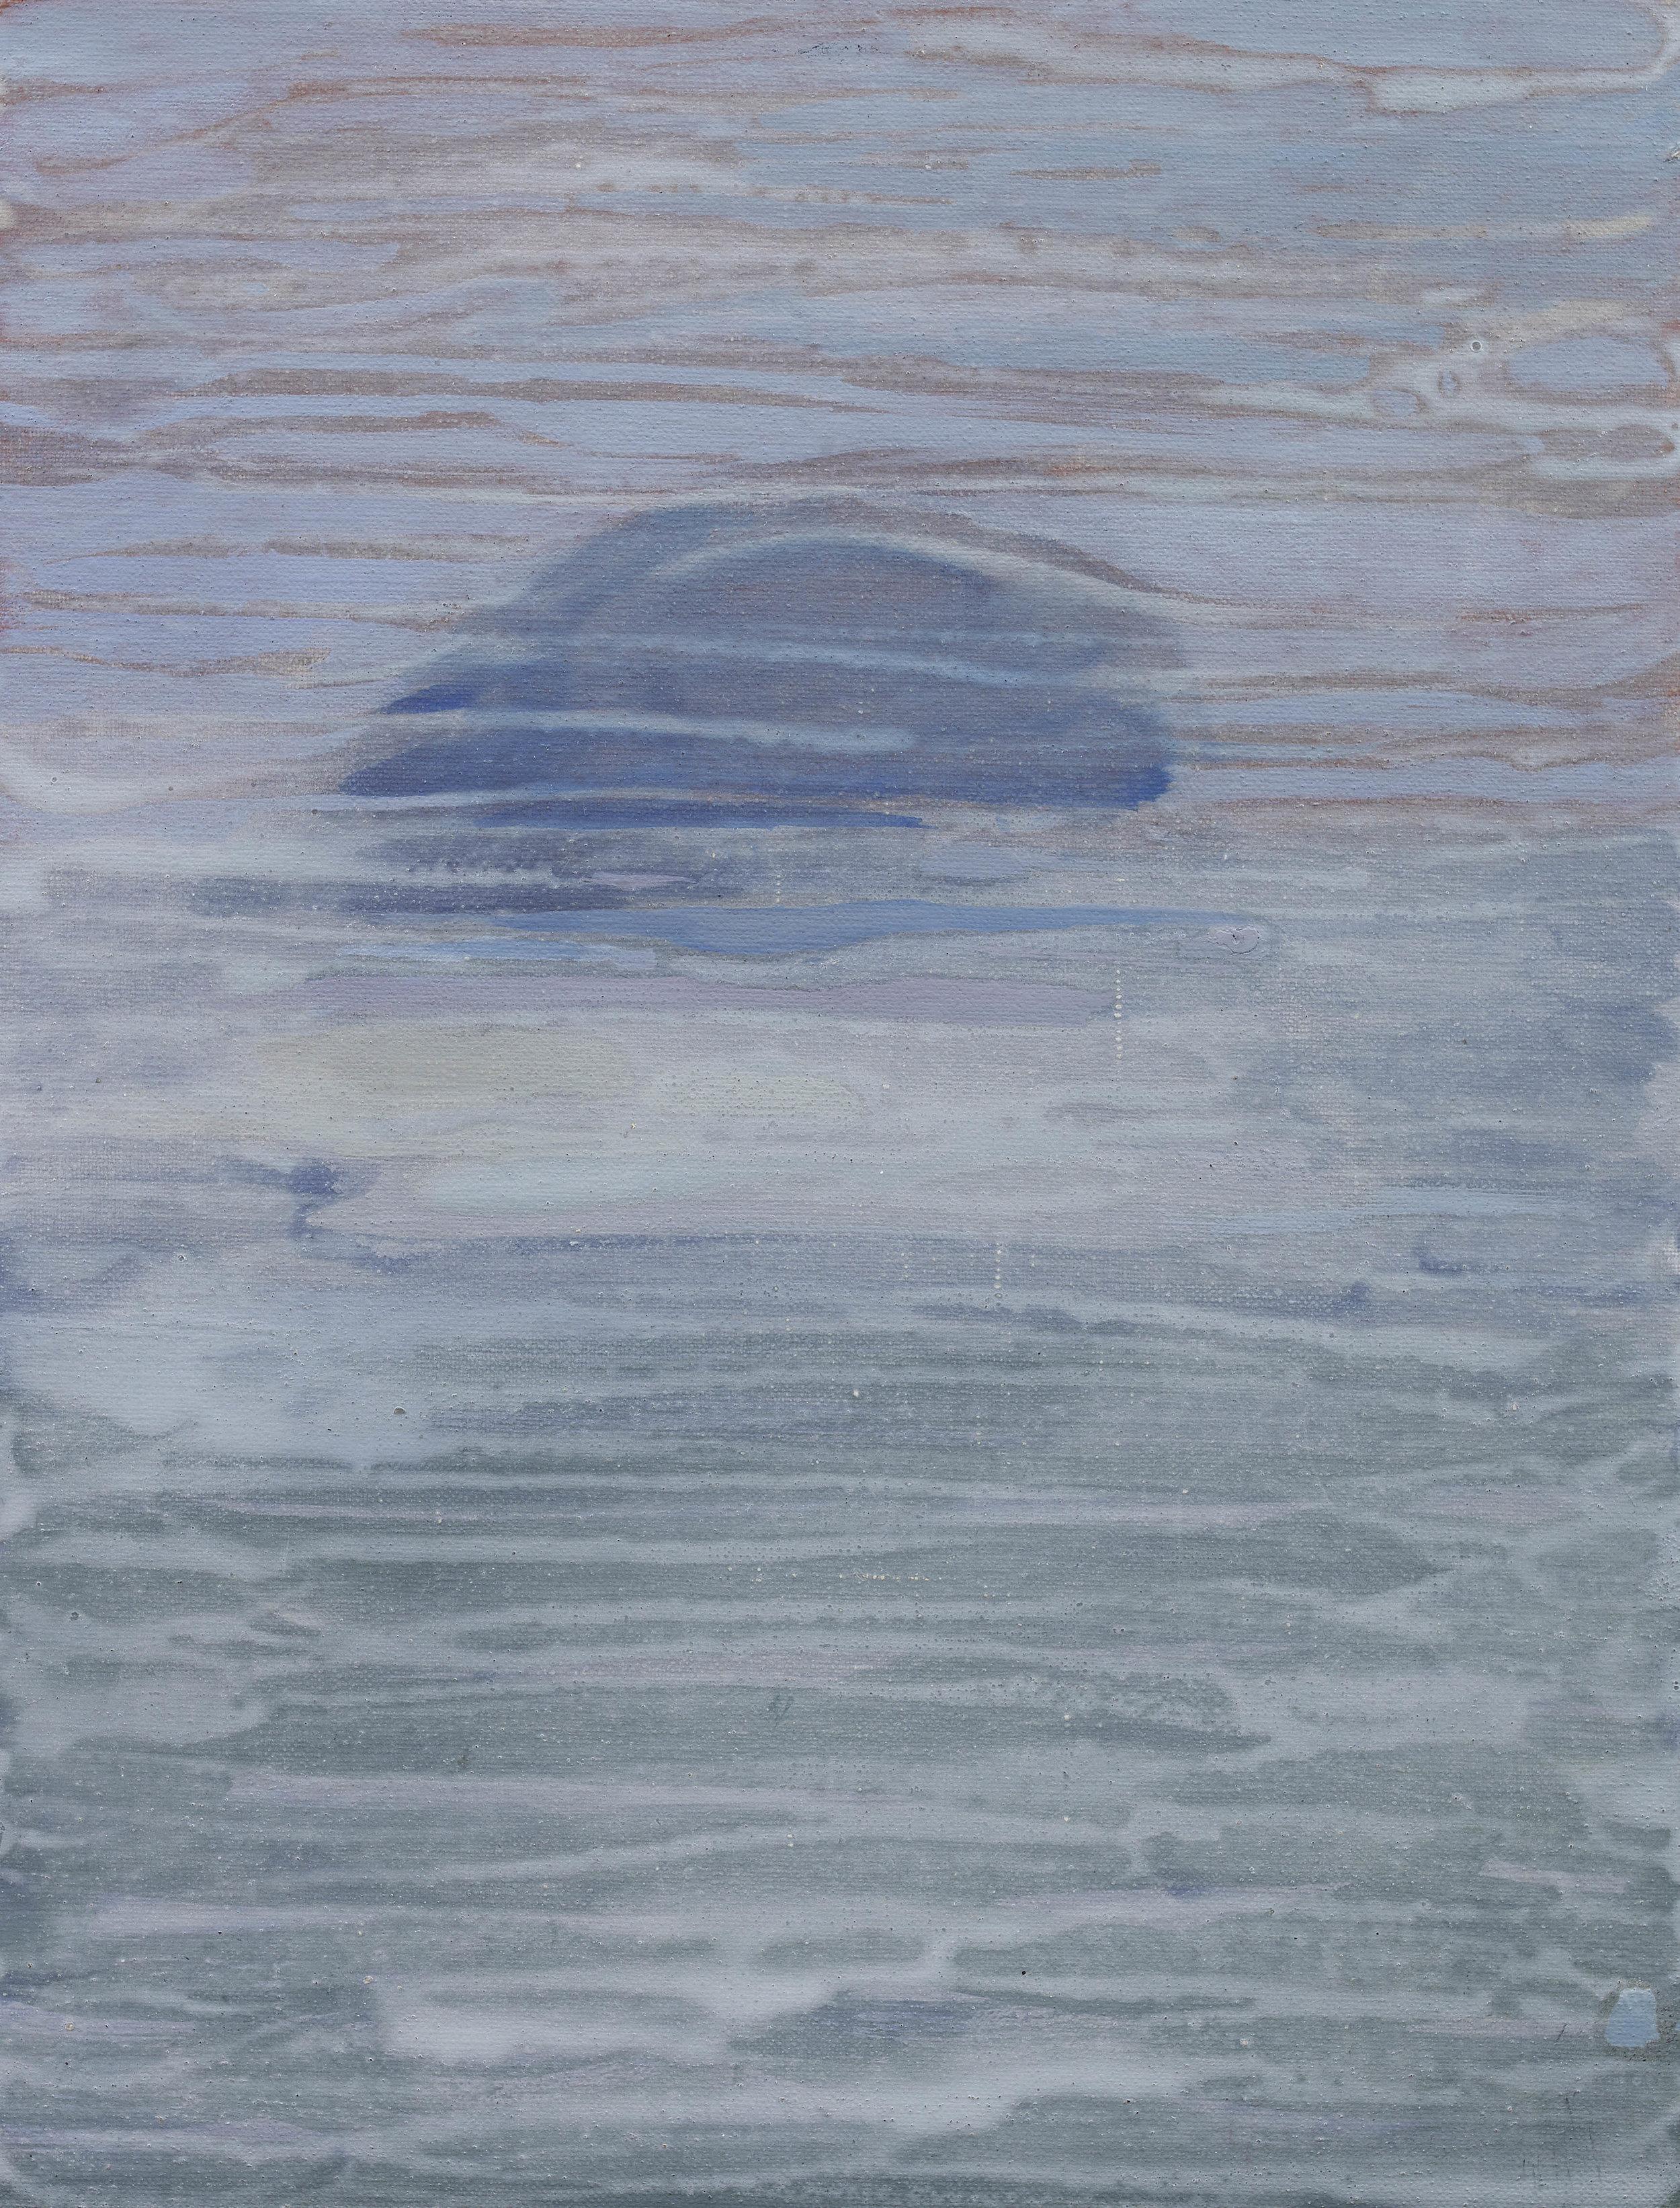 'Island' Oil on Linen 15½ x 11¾ ins 40 x 30 cms